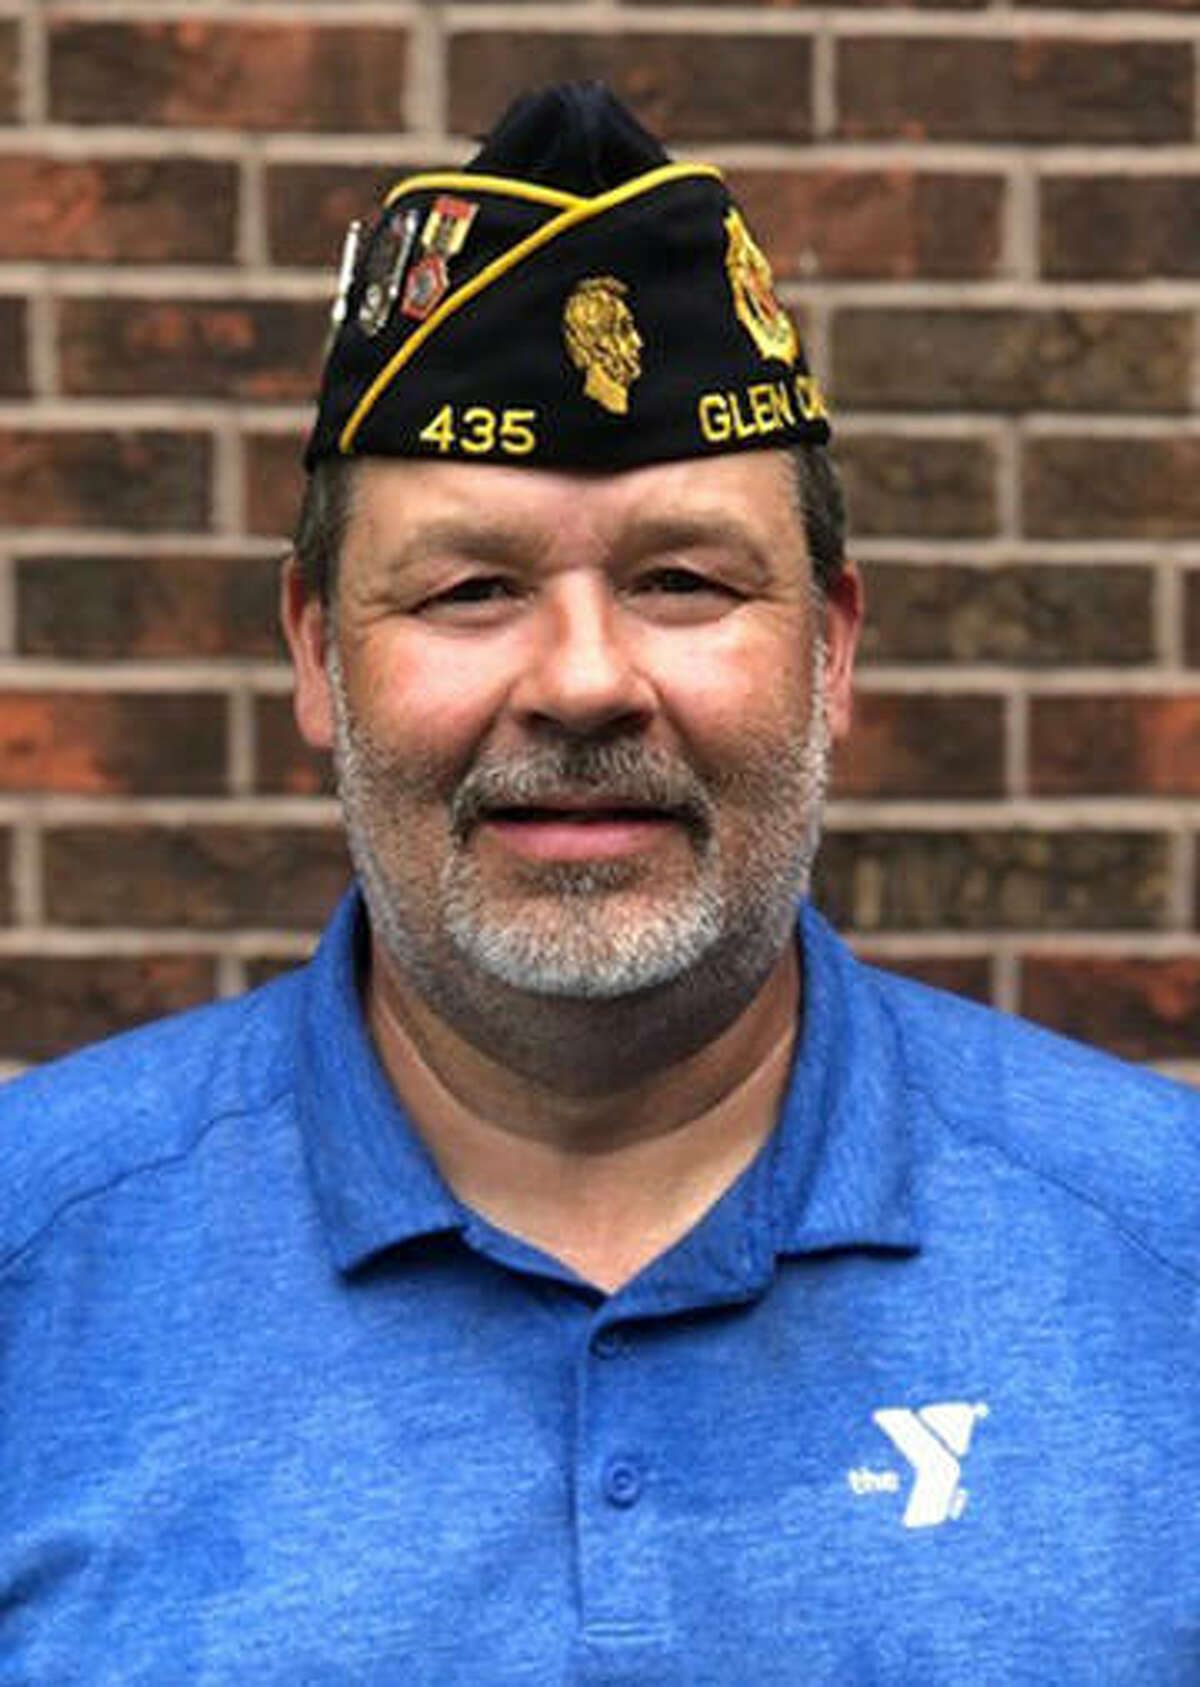 Steve Cox, commander of Glen Carbon American Legion Post 435